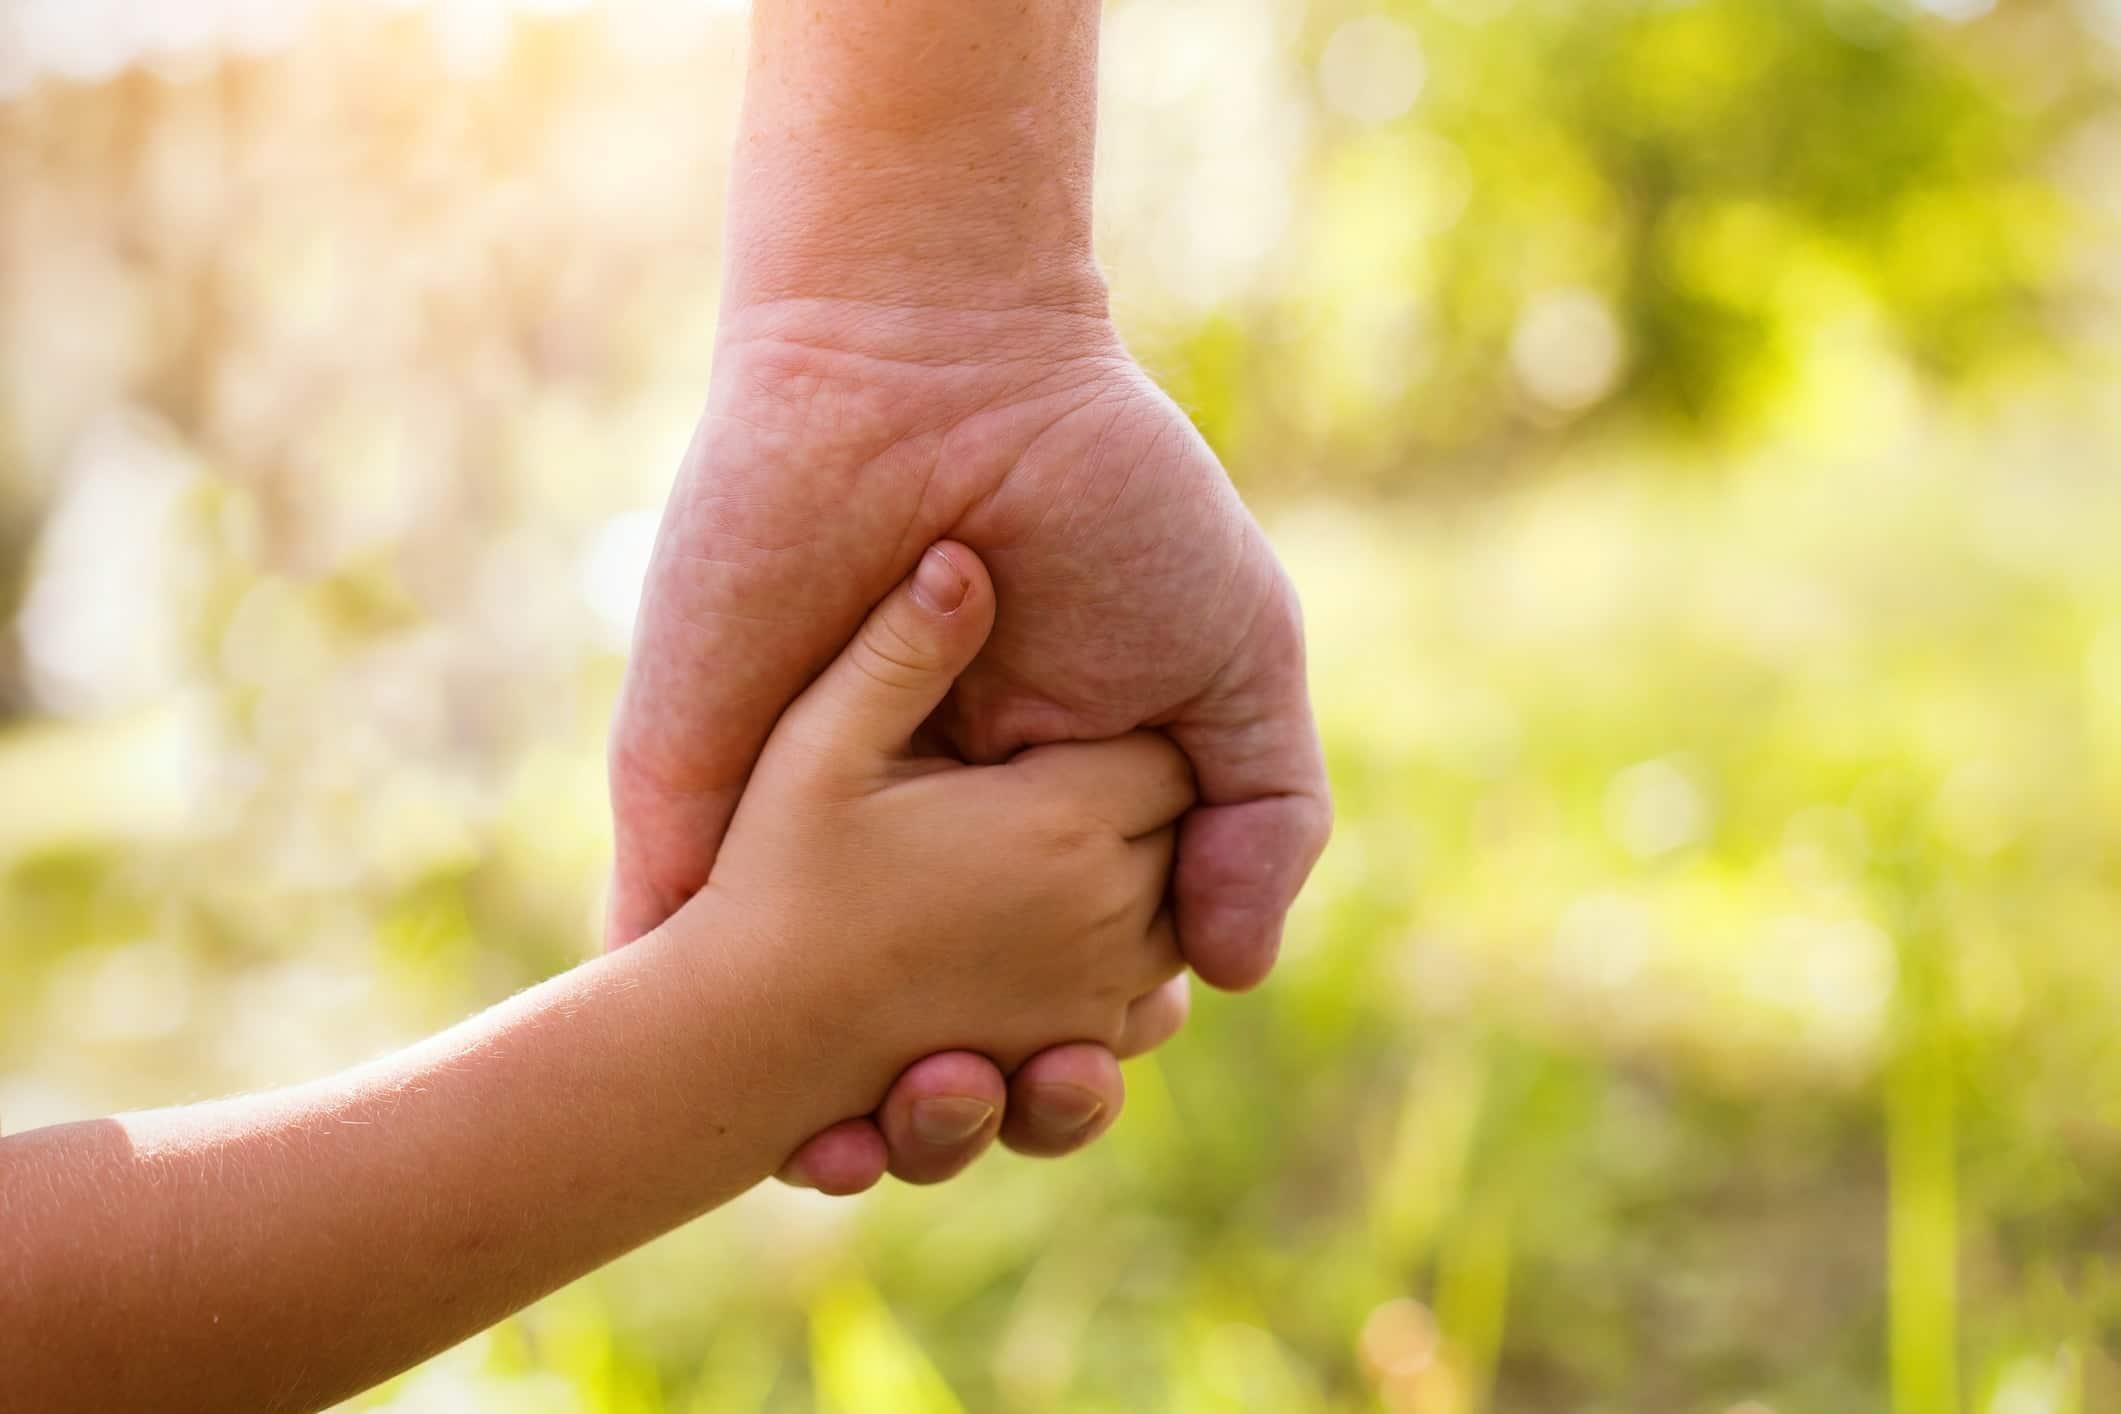 Child Support in British Columbia